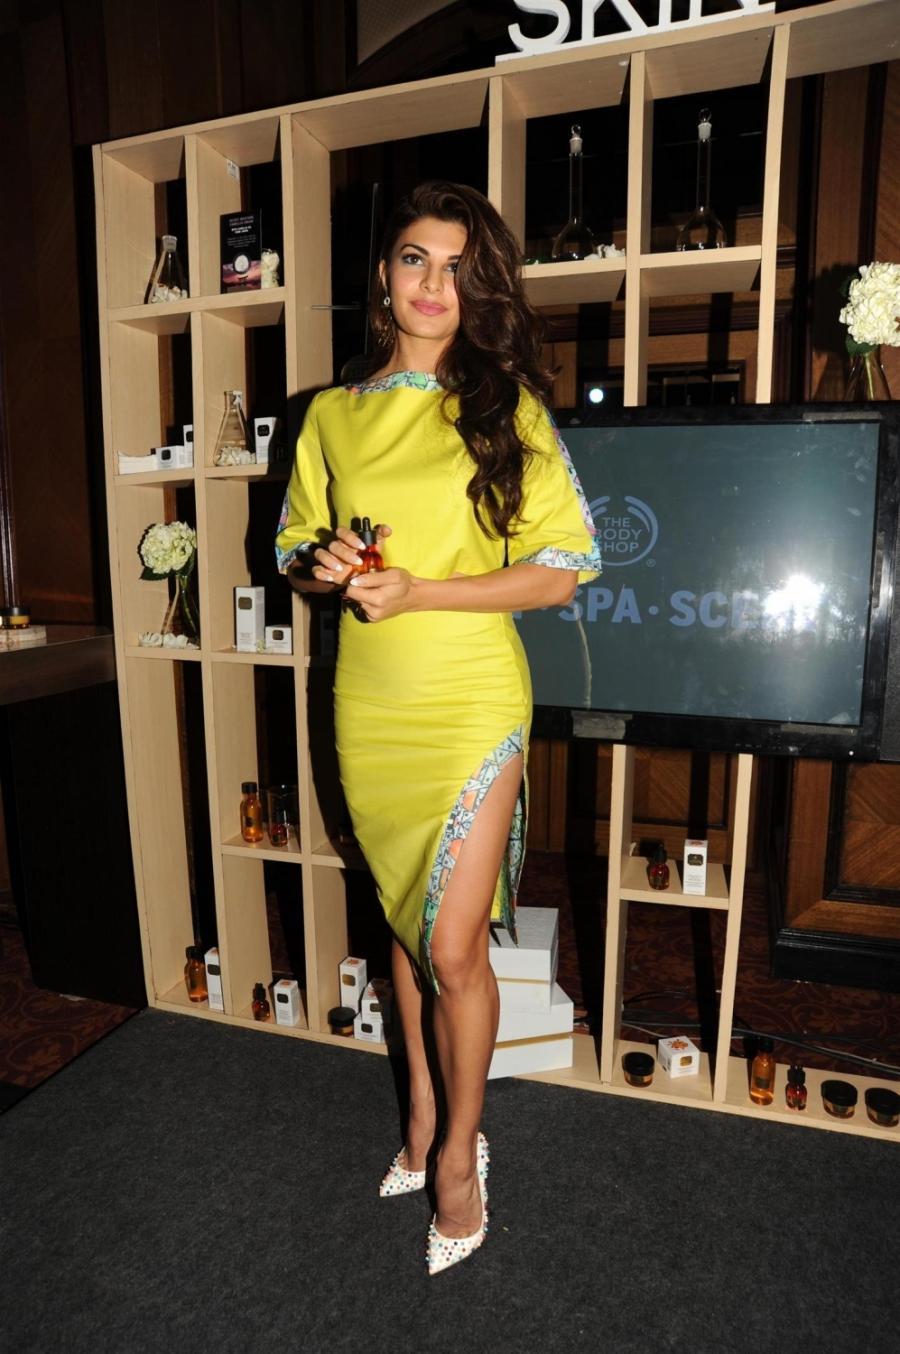 Jacqueline Fernandez Hot Legs Show Photos In Short Yellow Dress